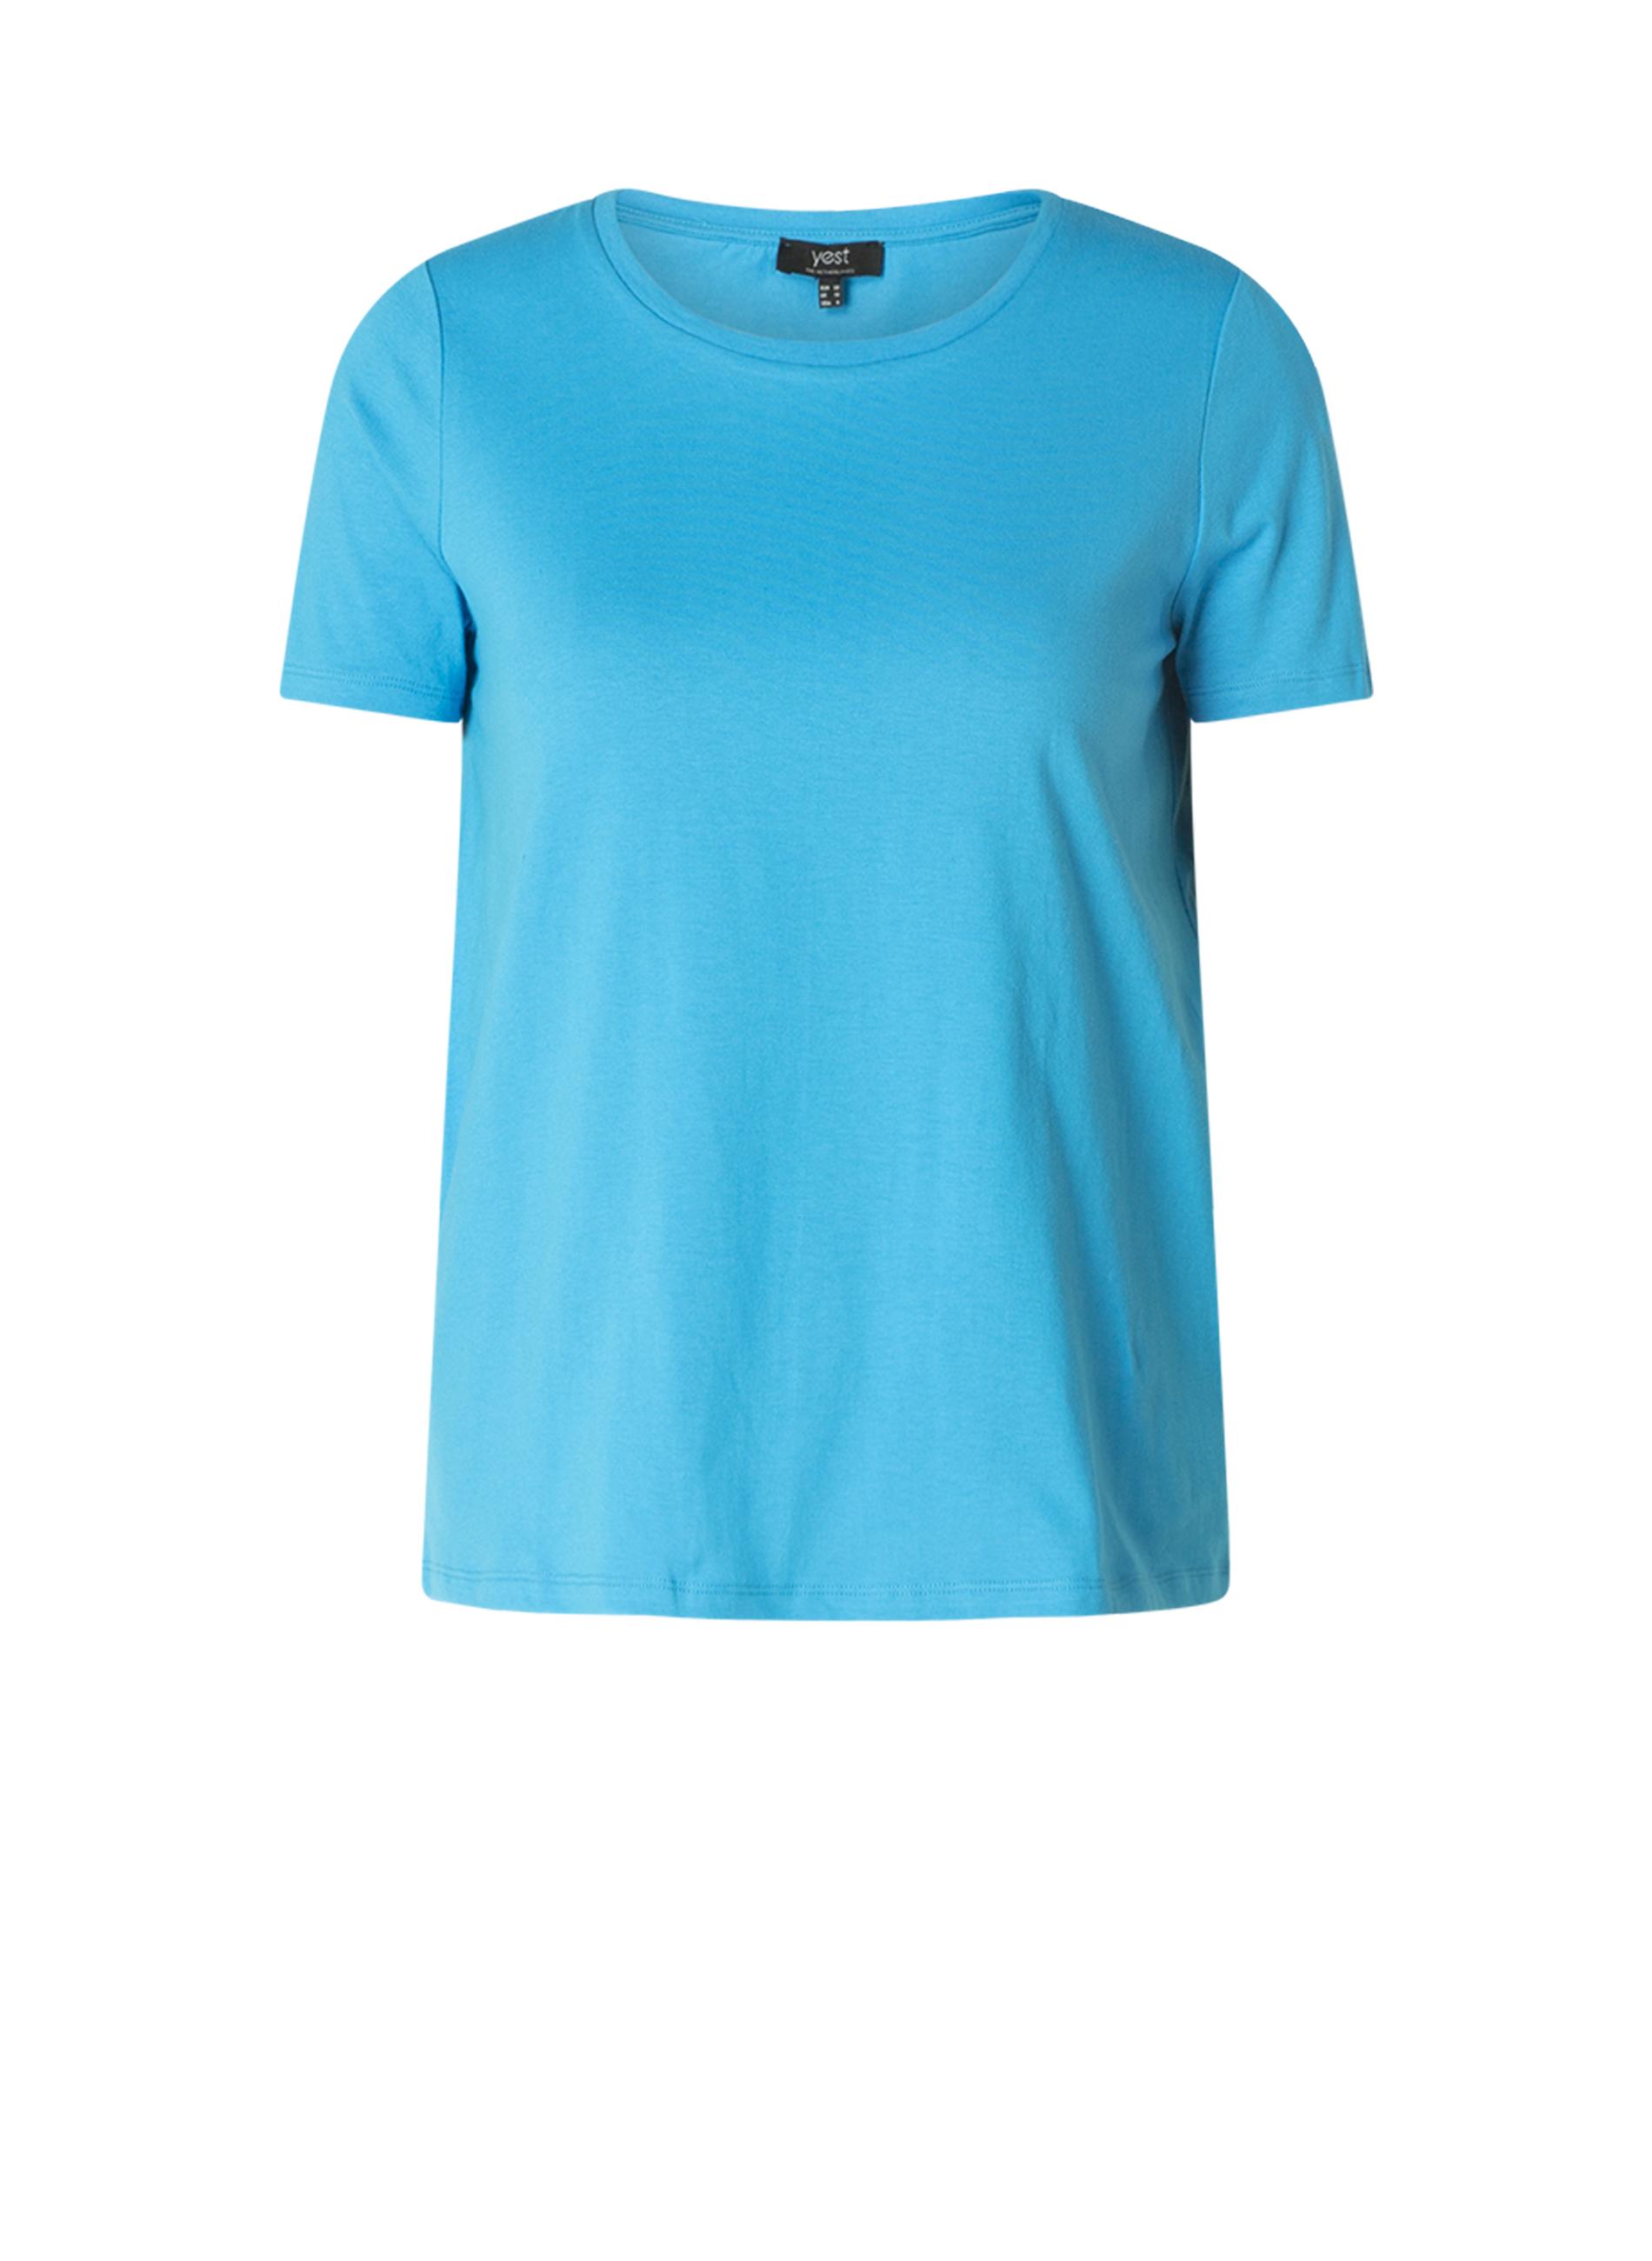 Shirt Lille Yesta